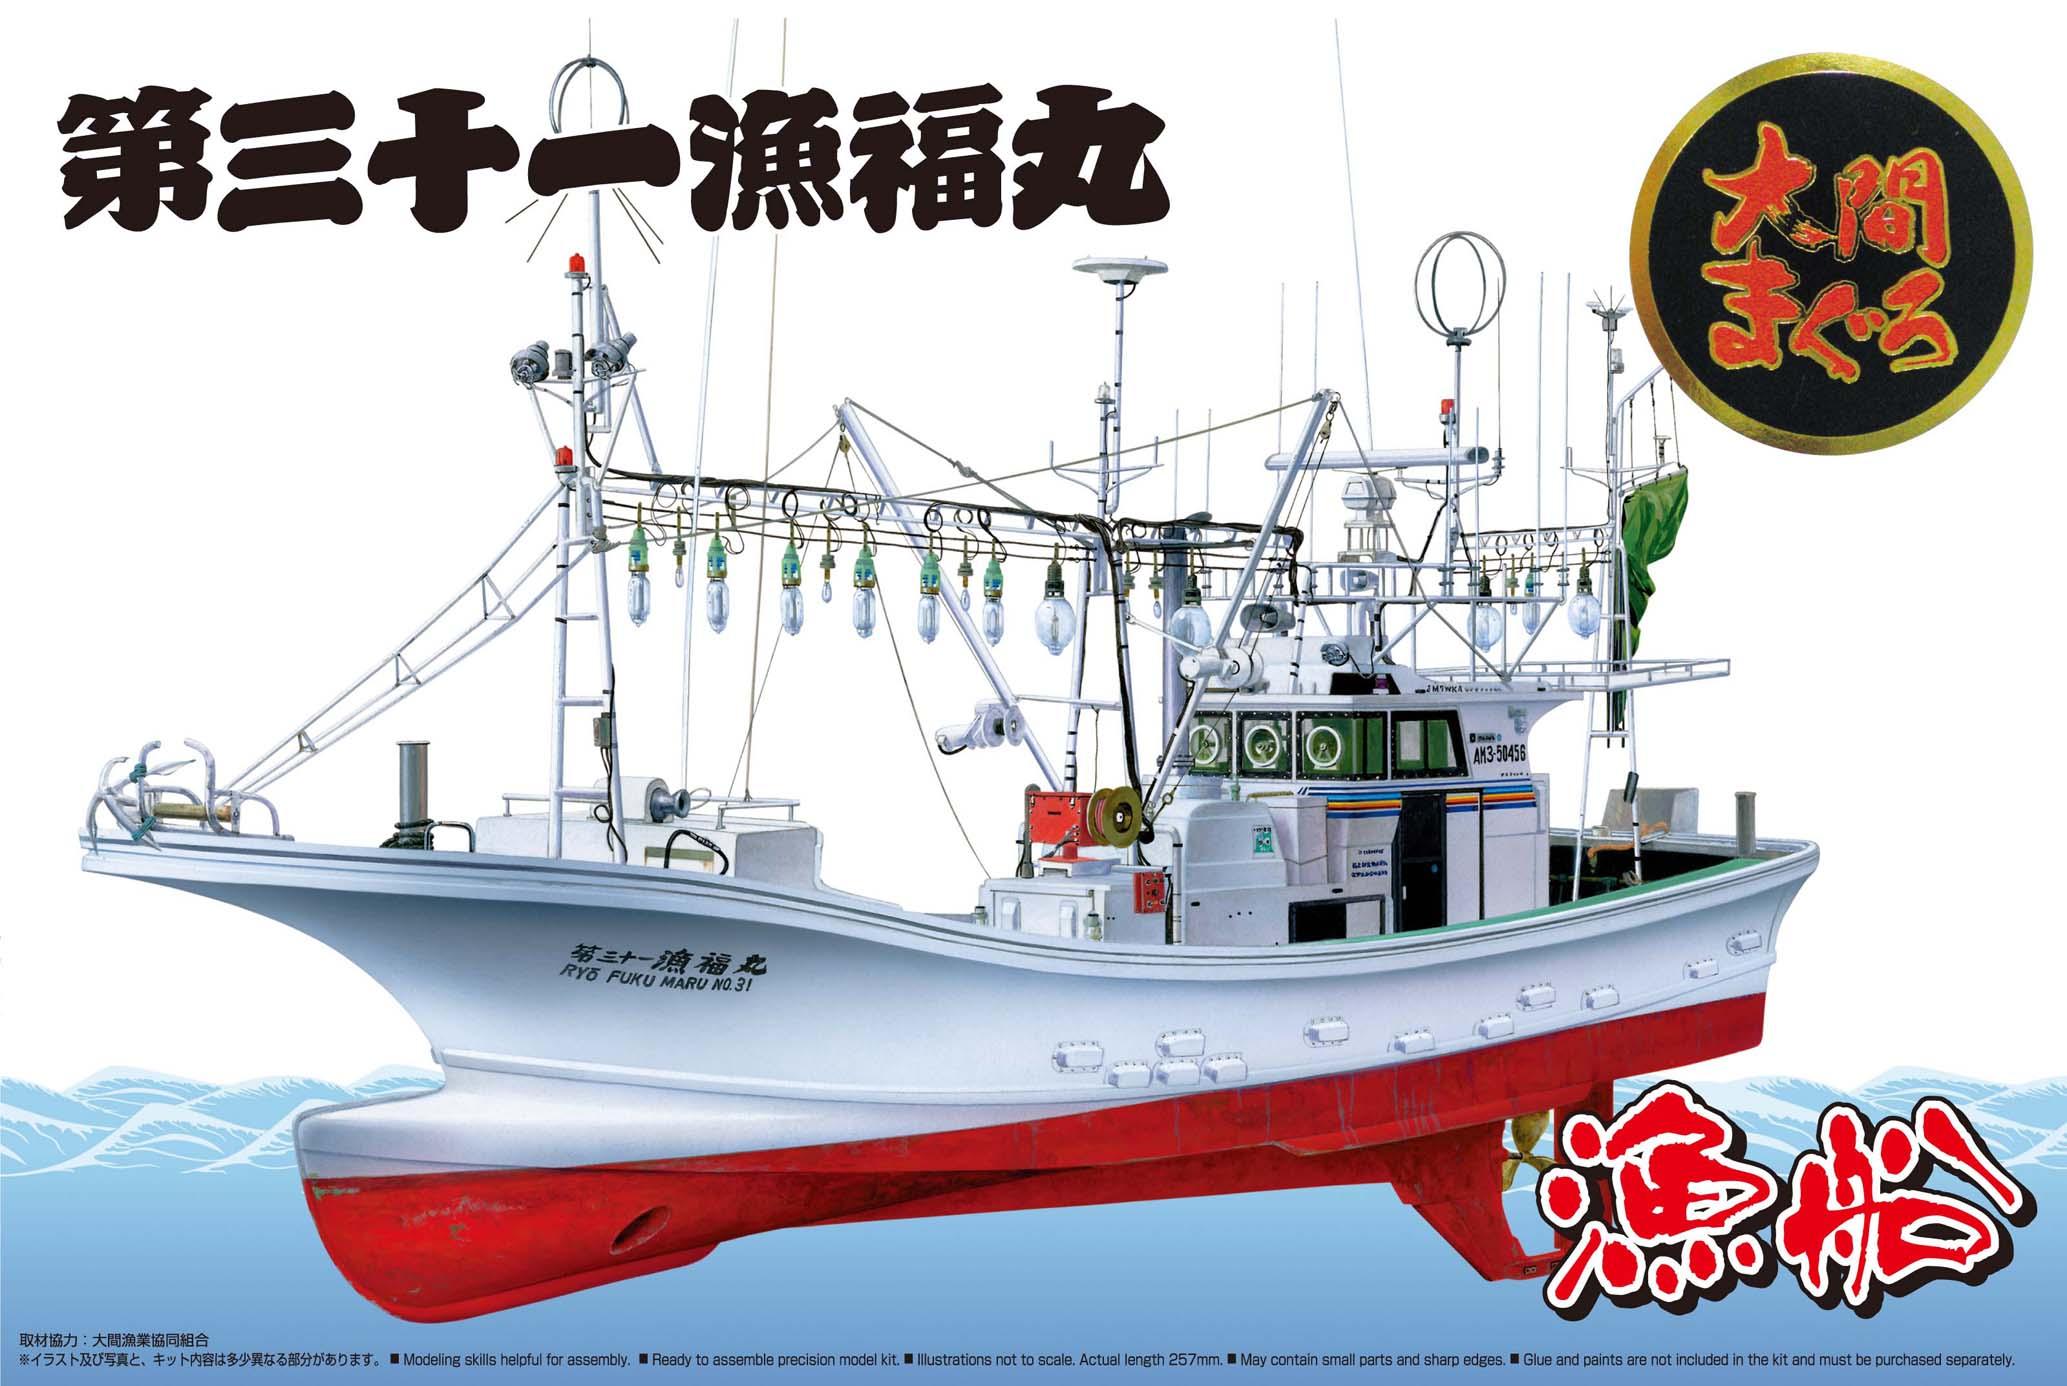 Aoshima 1/64 Ooma'S Tuna Fishing Boat Ryoufuku-Maru No.31 Full Hull Model